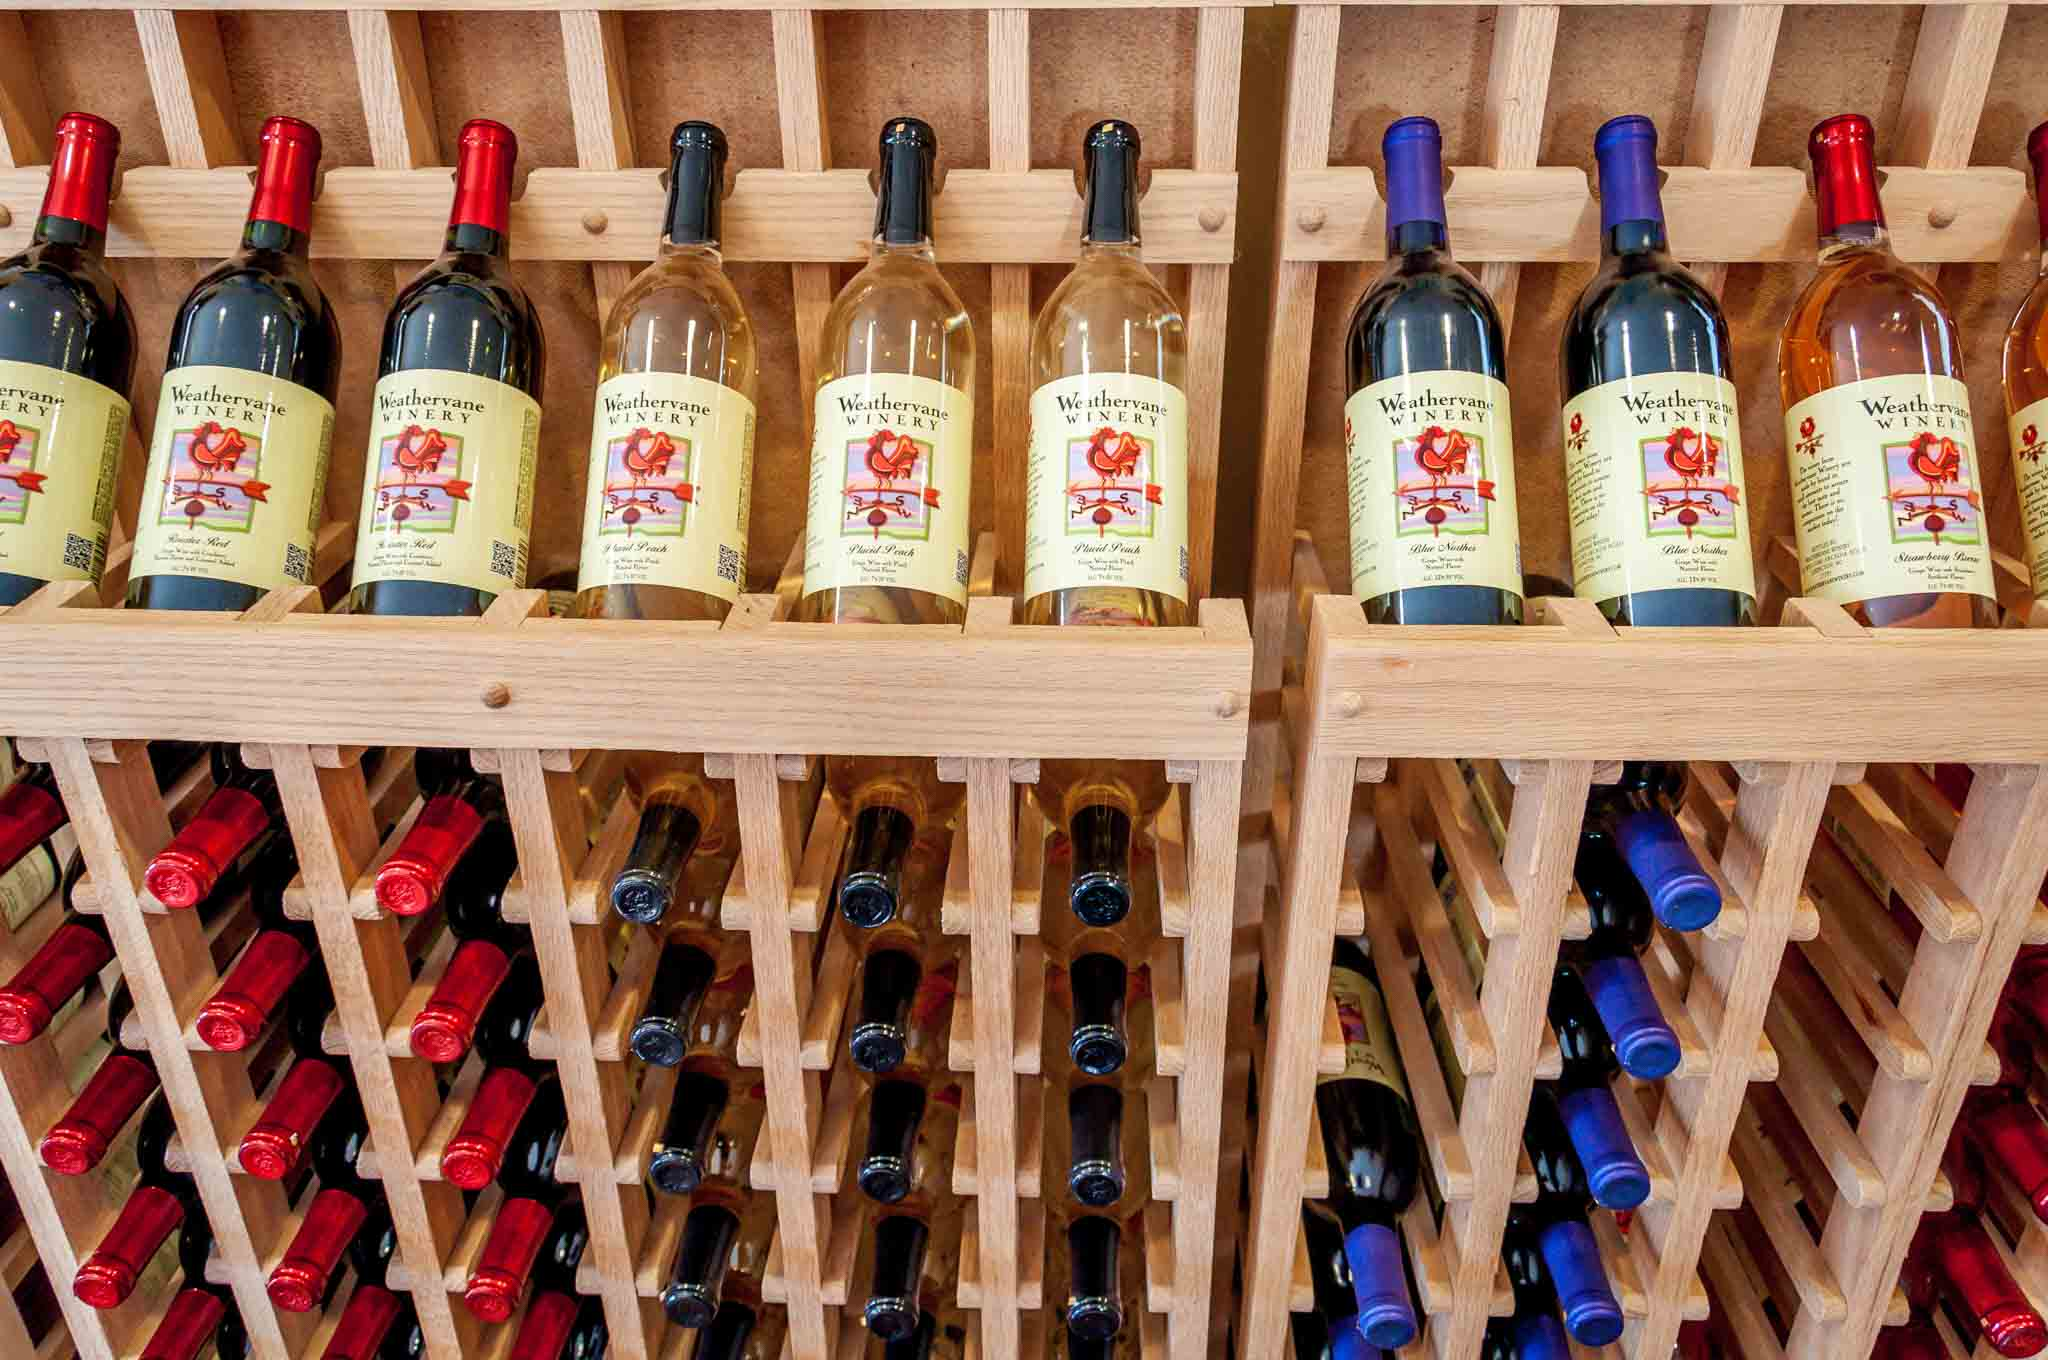 Wine bottles on display at Weathervane Winery